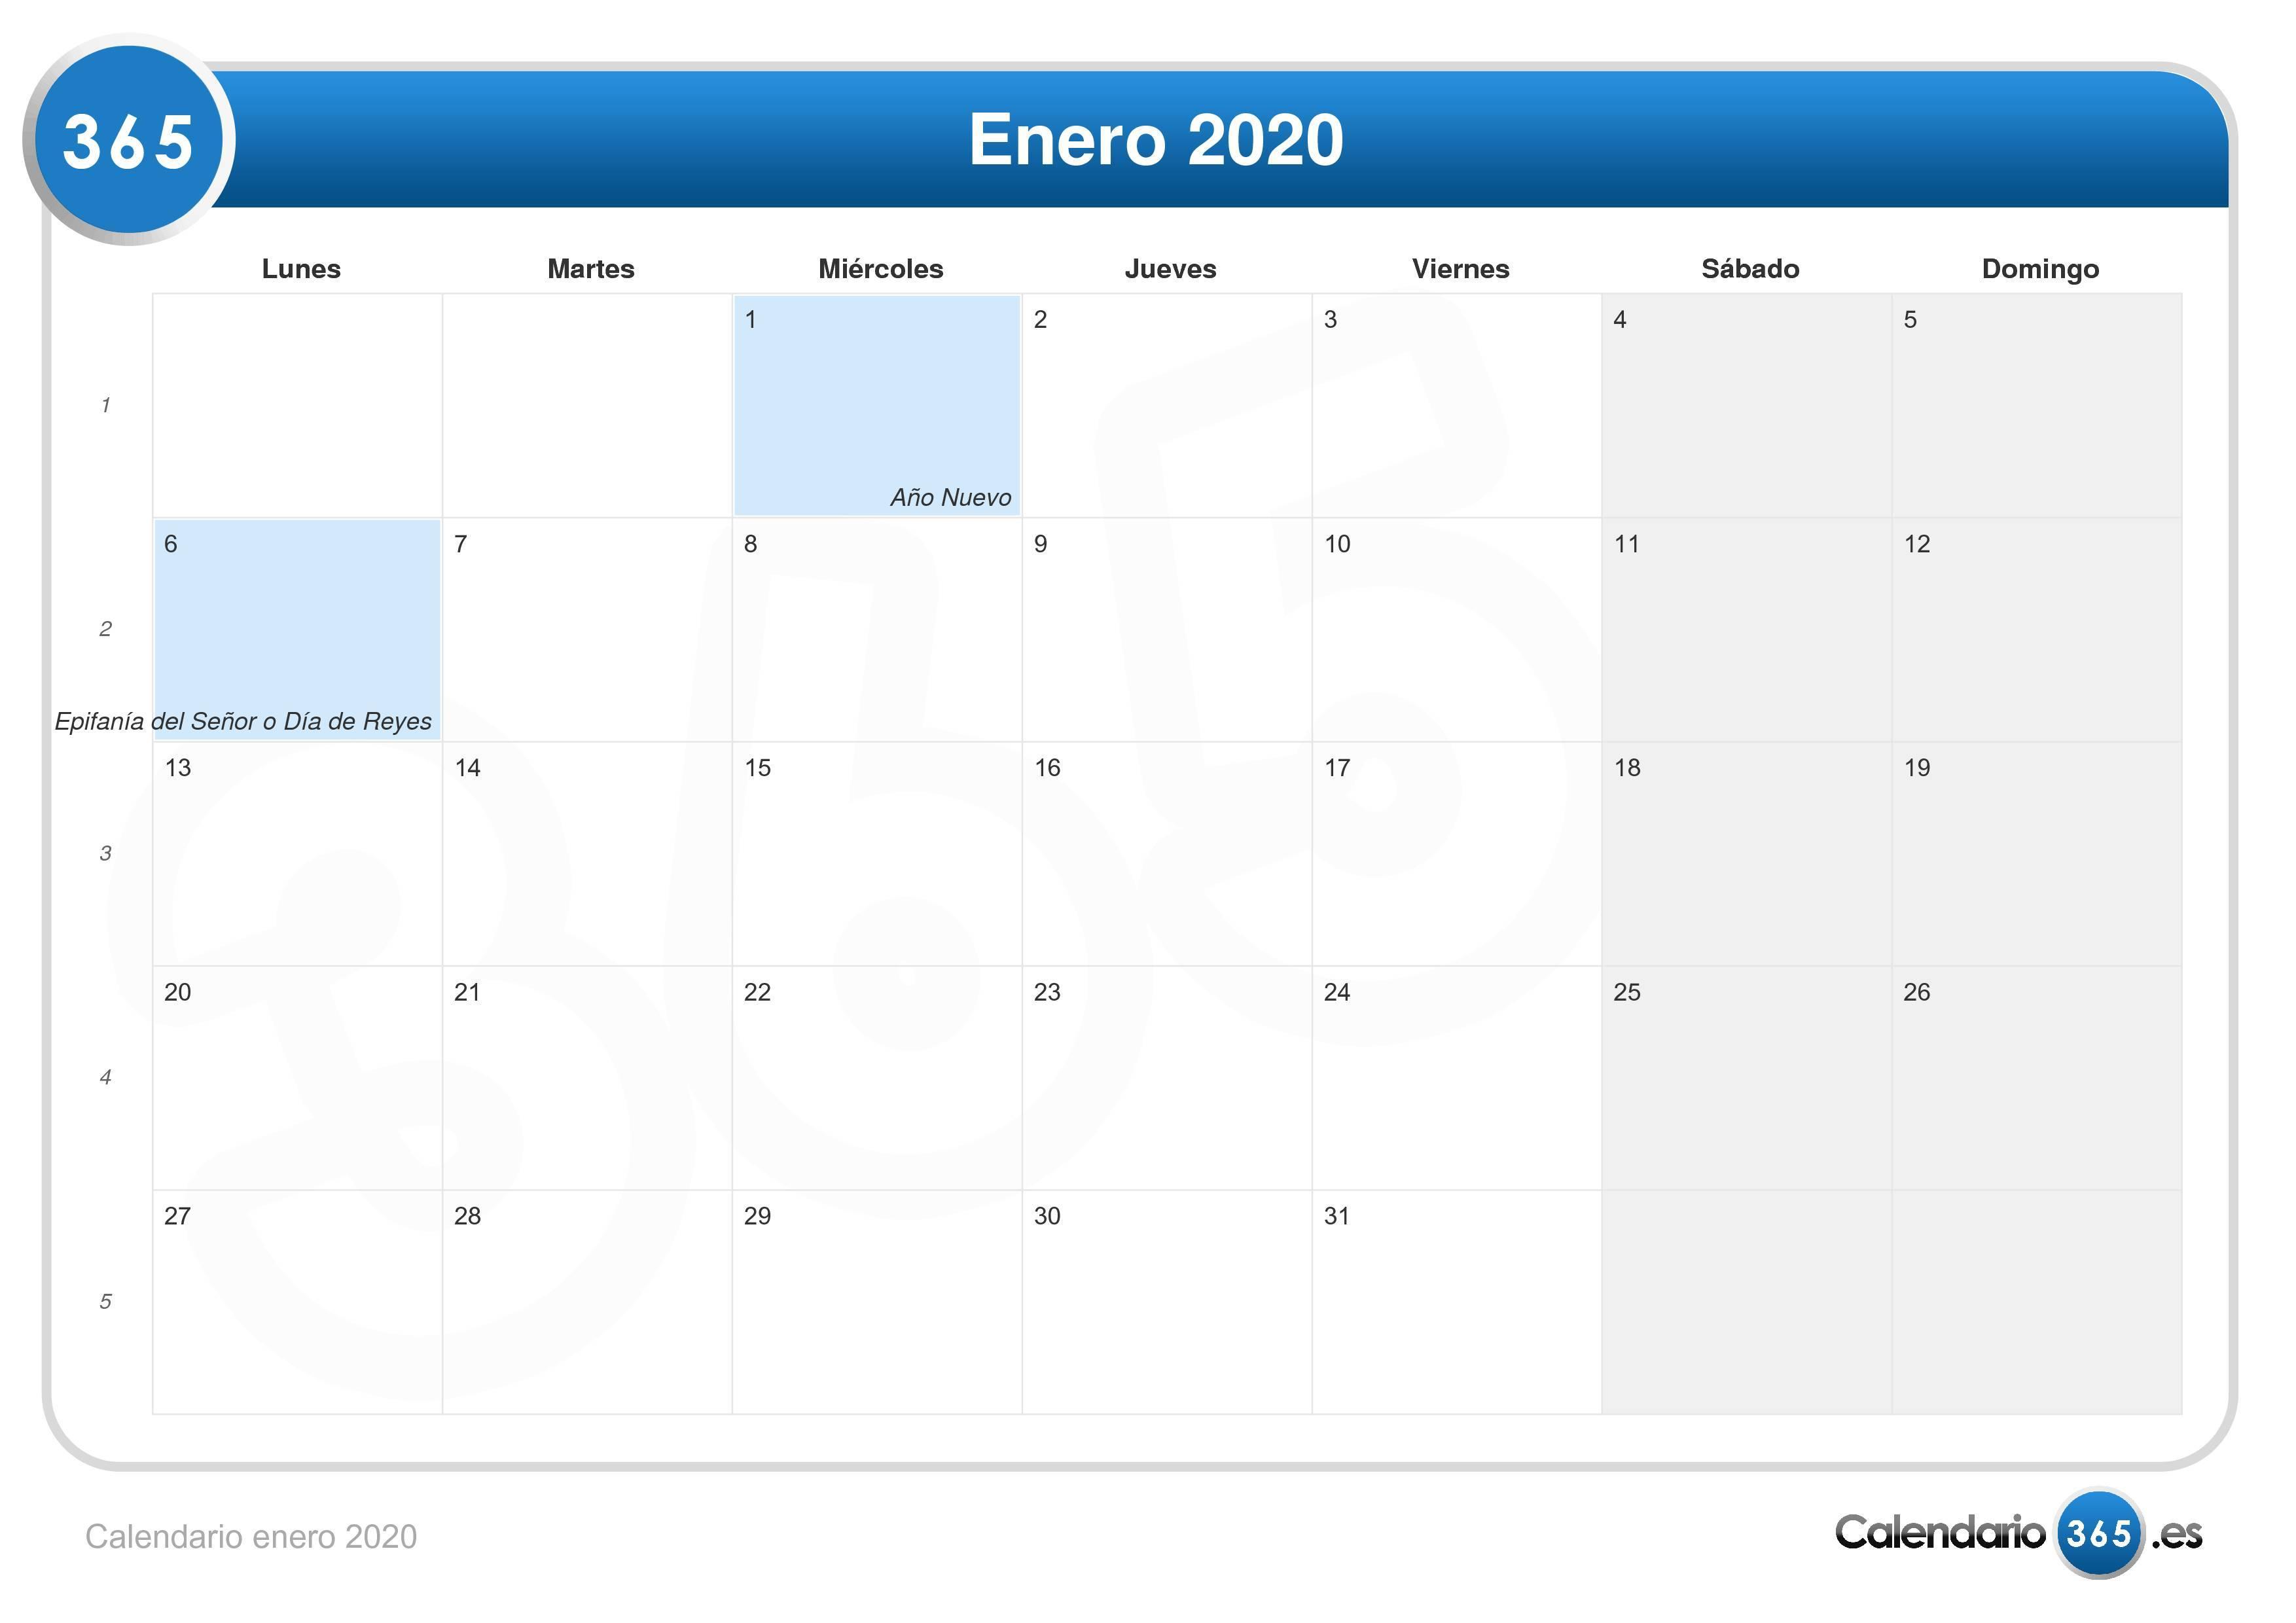 Calendario Mes De Octubre 2020 Para Imprimir.Calendario Enero 2020